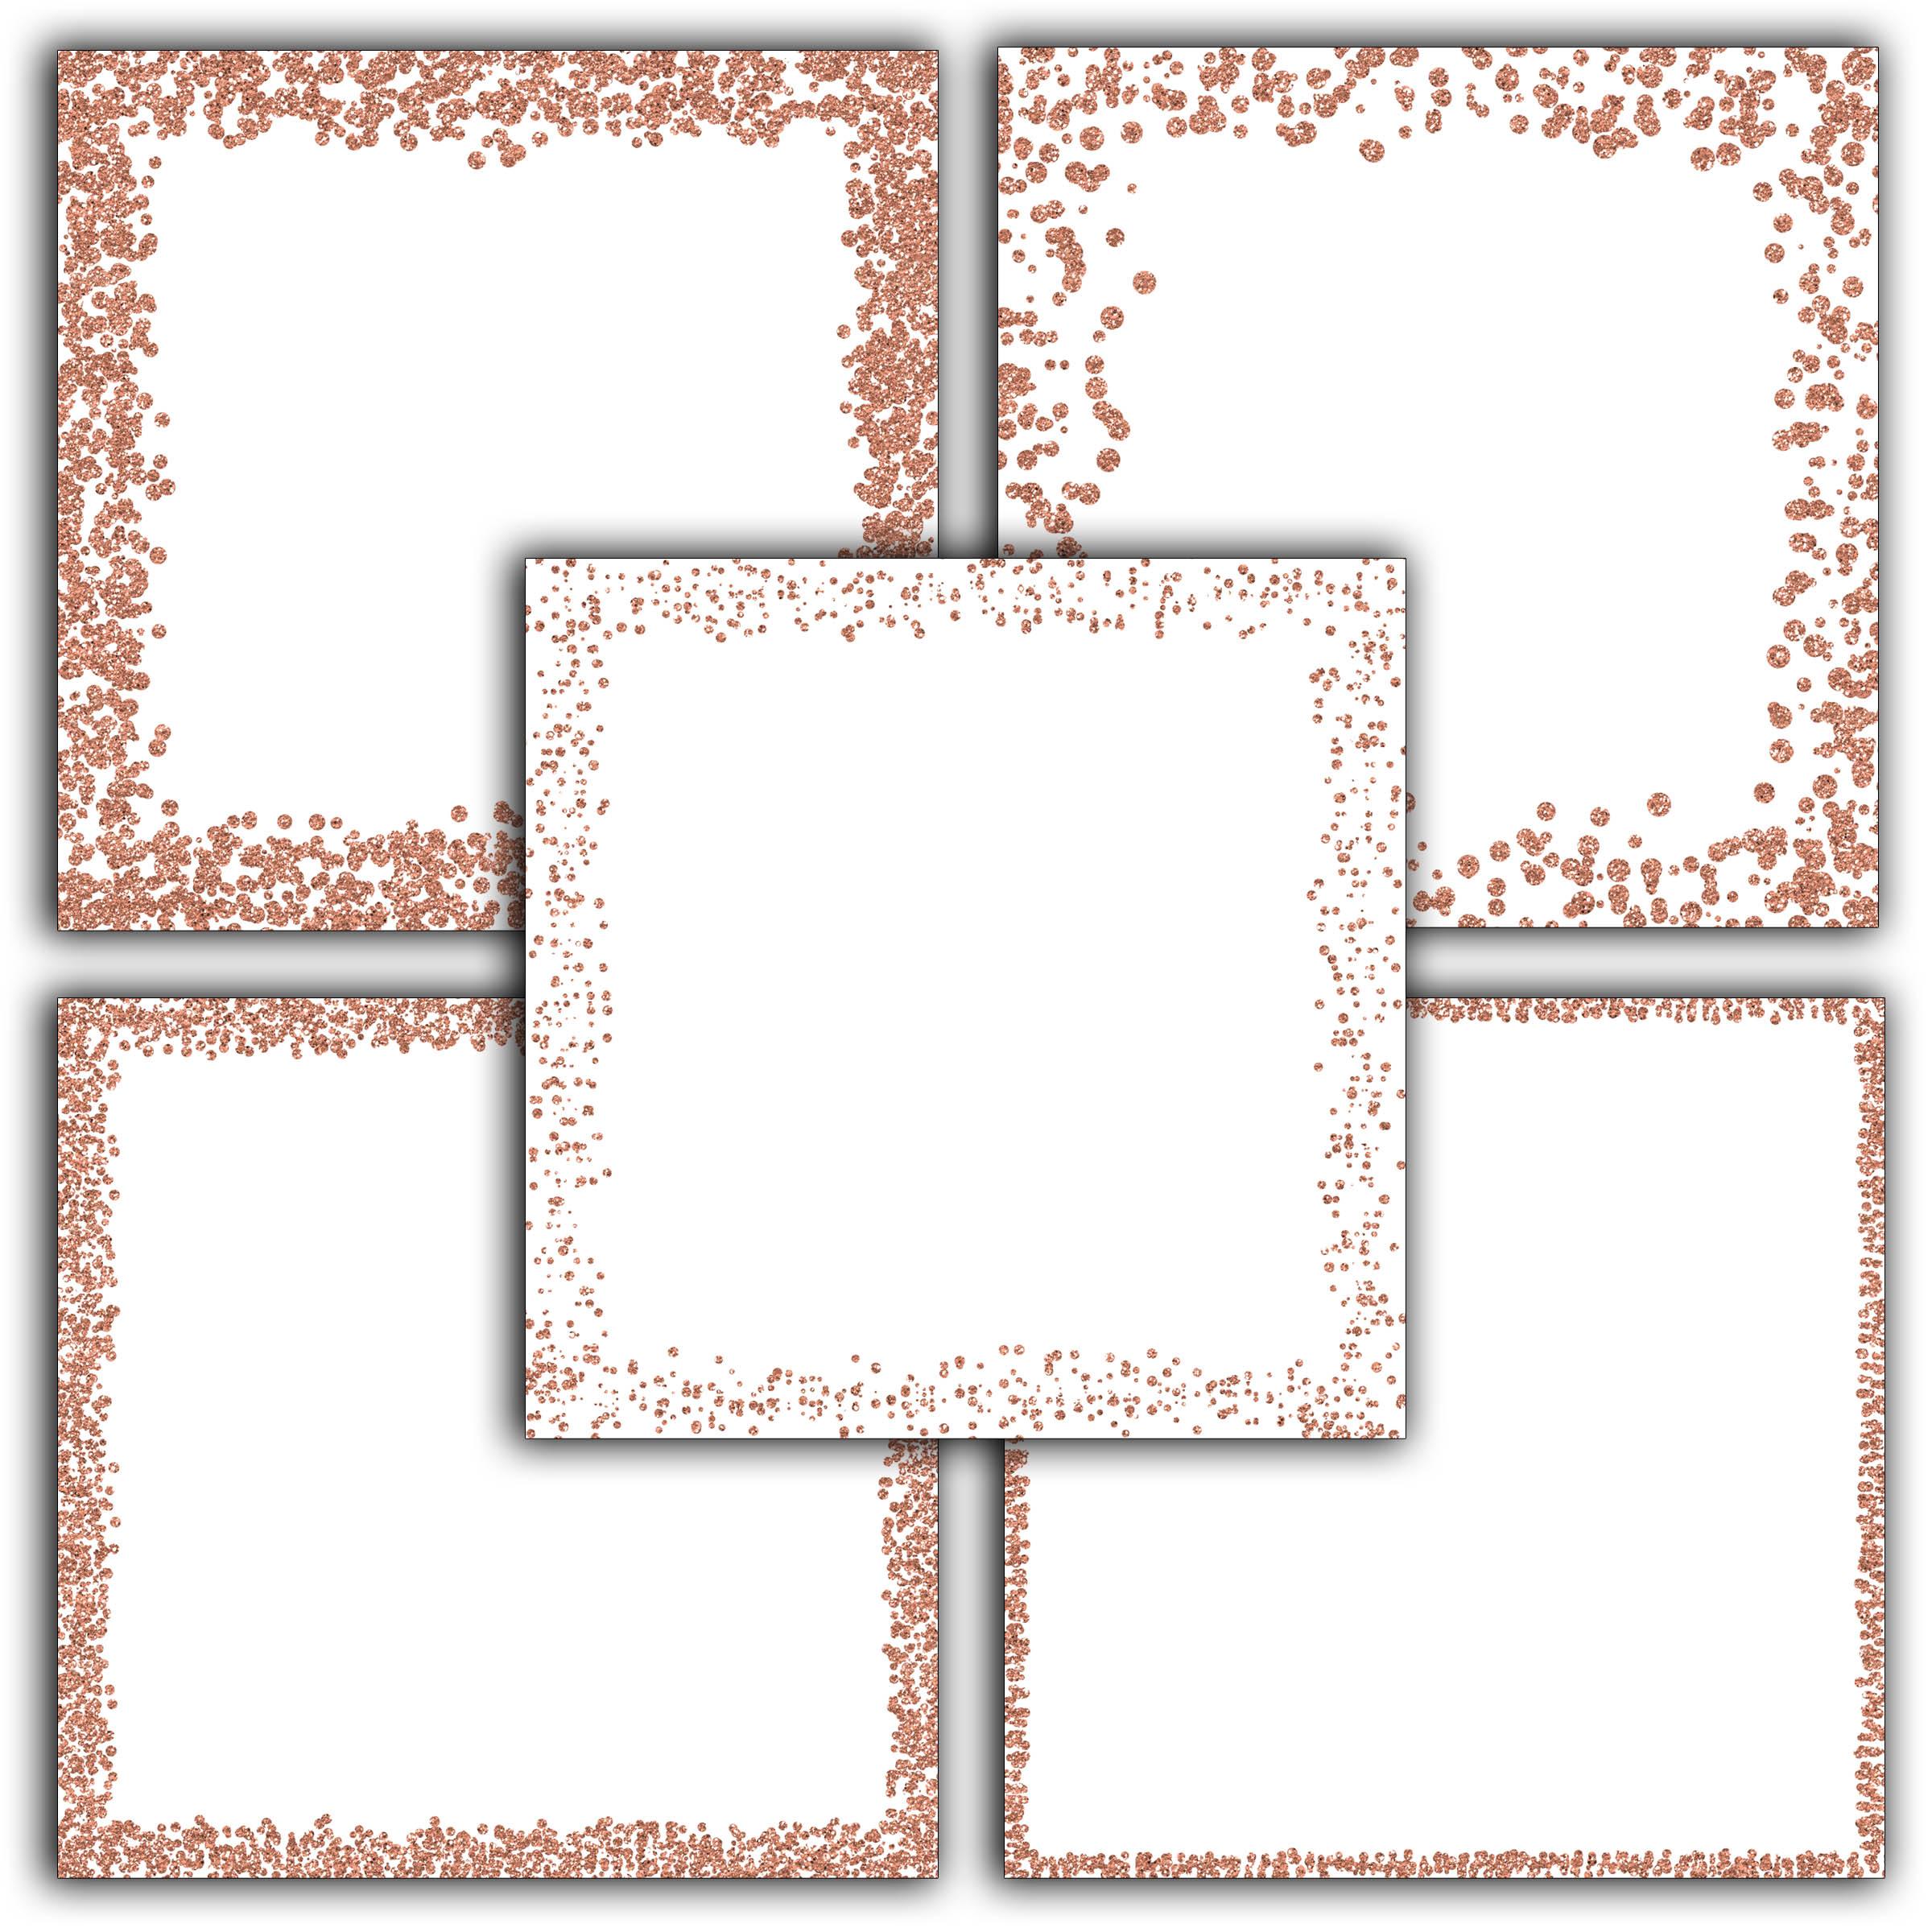 Rose Gold Glitter Borders Digital Paper example image 3